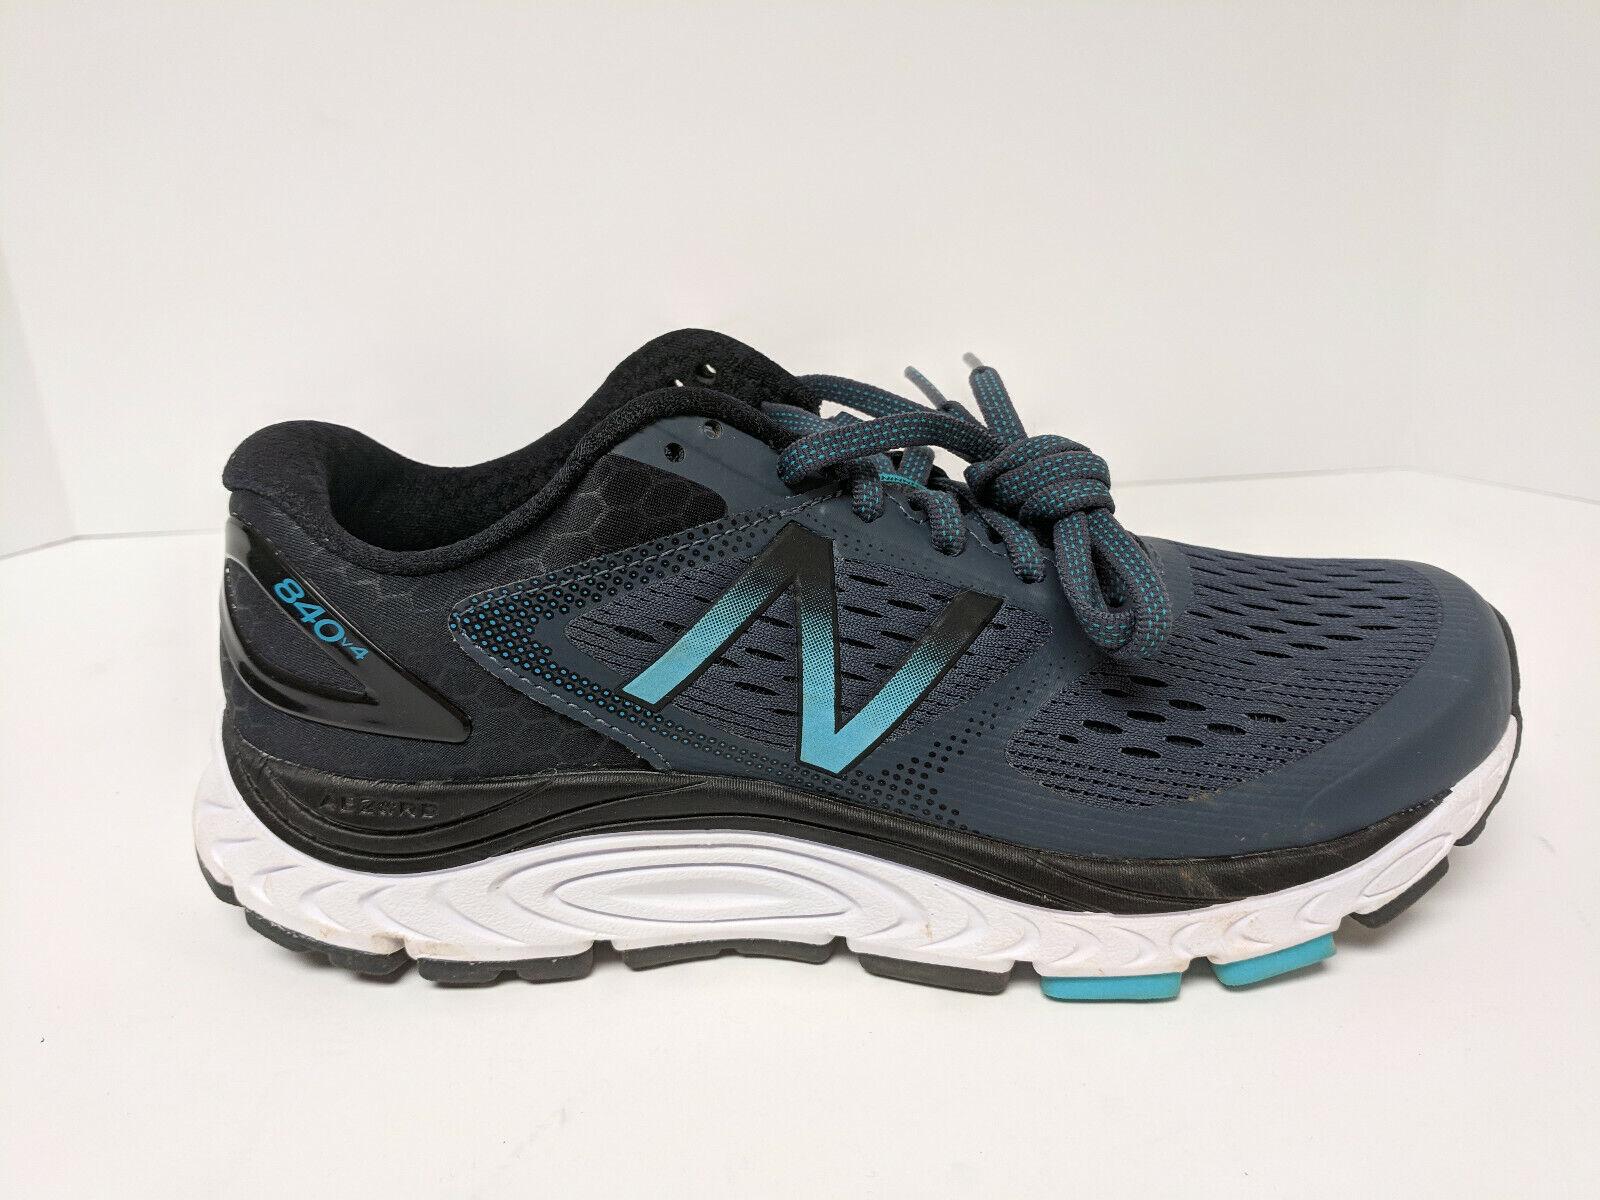 New Balance 840v4 Running schuhe, Dark grau, damen 9 M